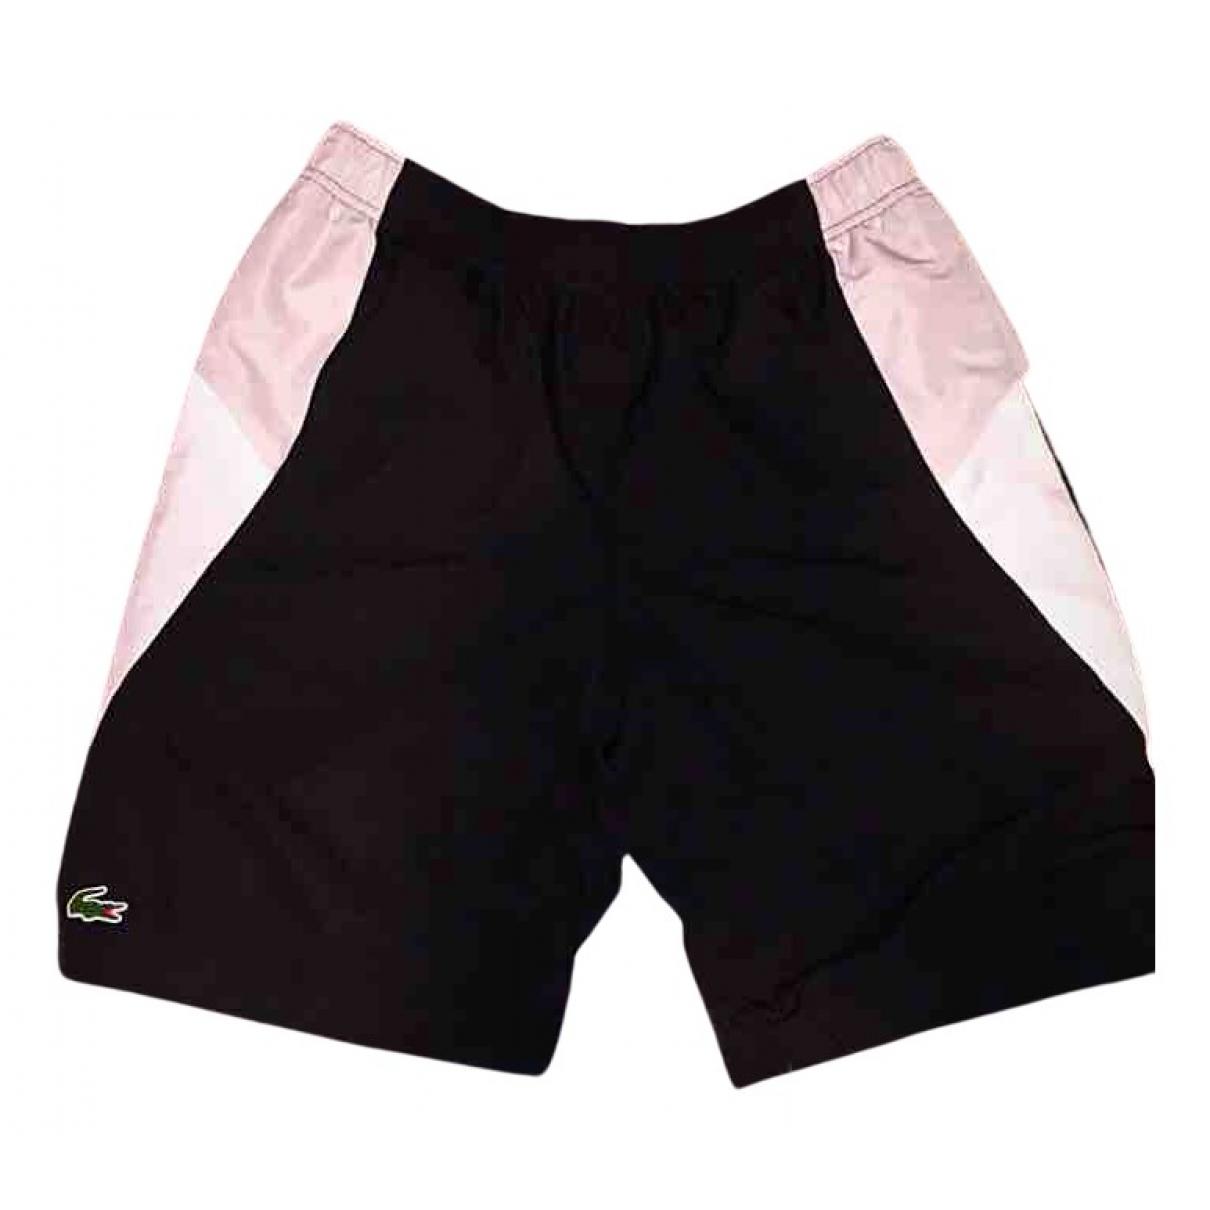 Pantalon corto Lacoste